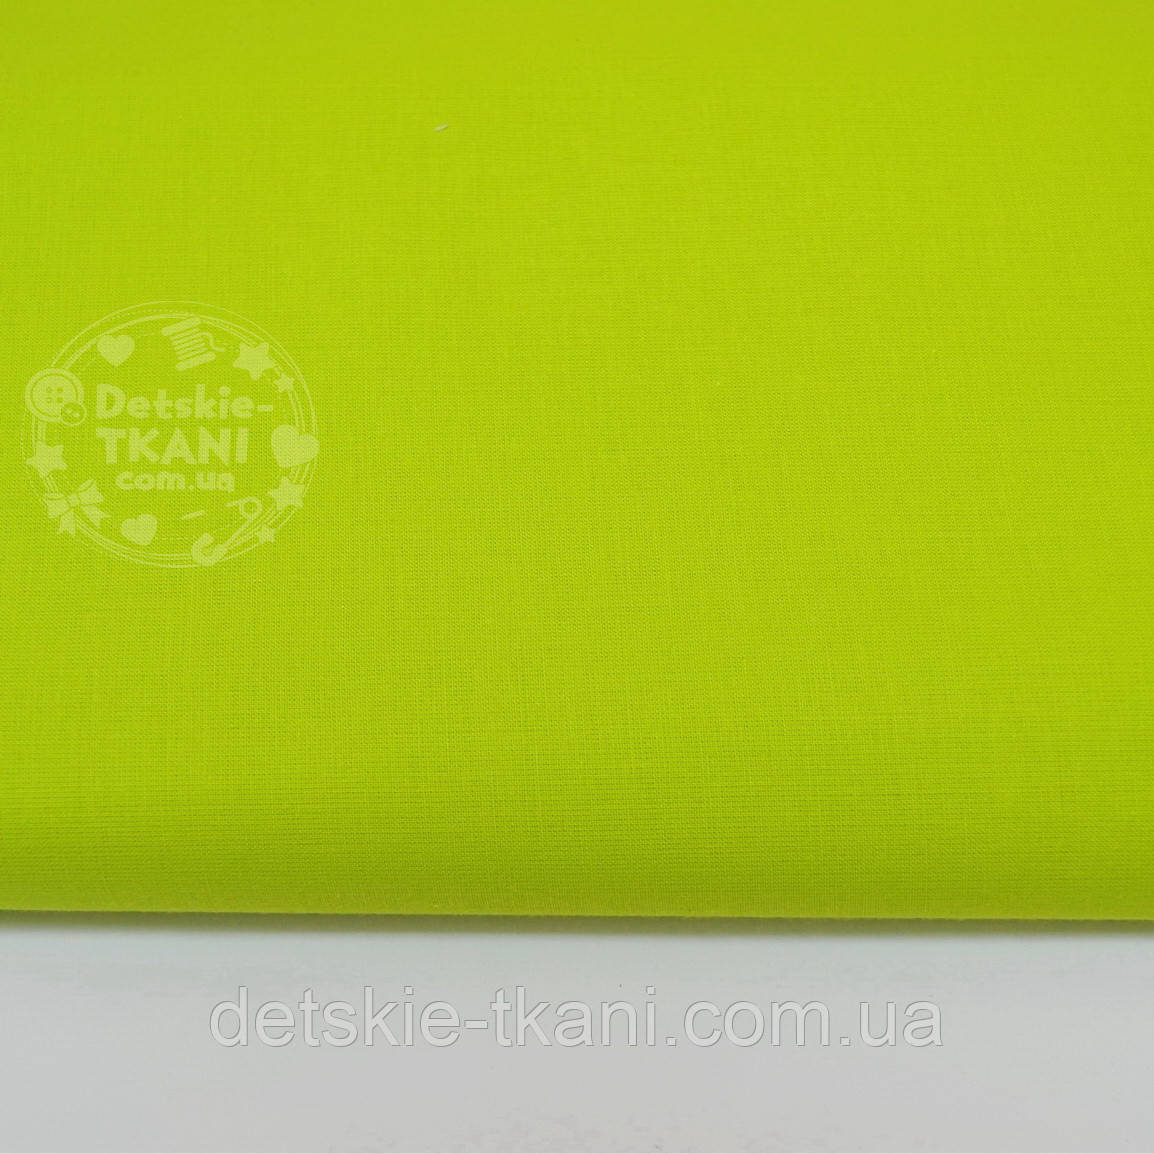 Однотонная польская бязь светло-зеленая (№ 808а).